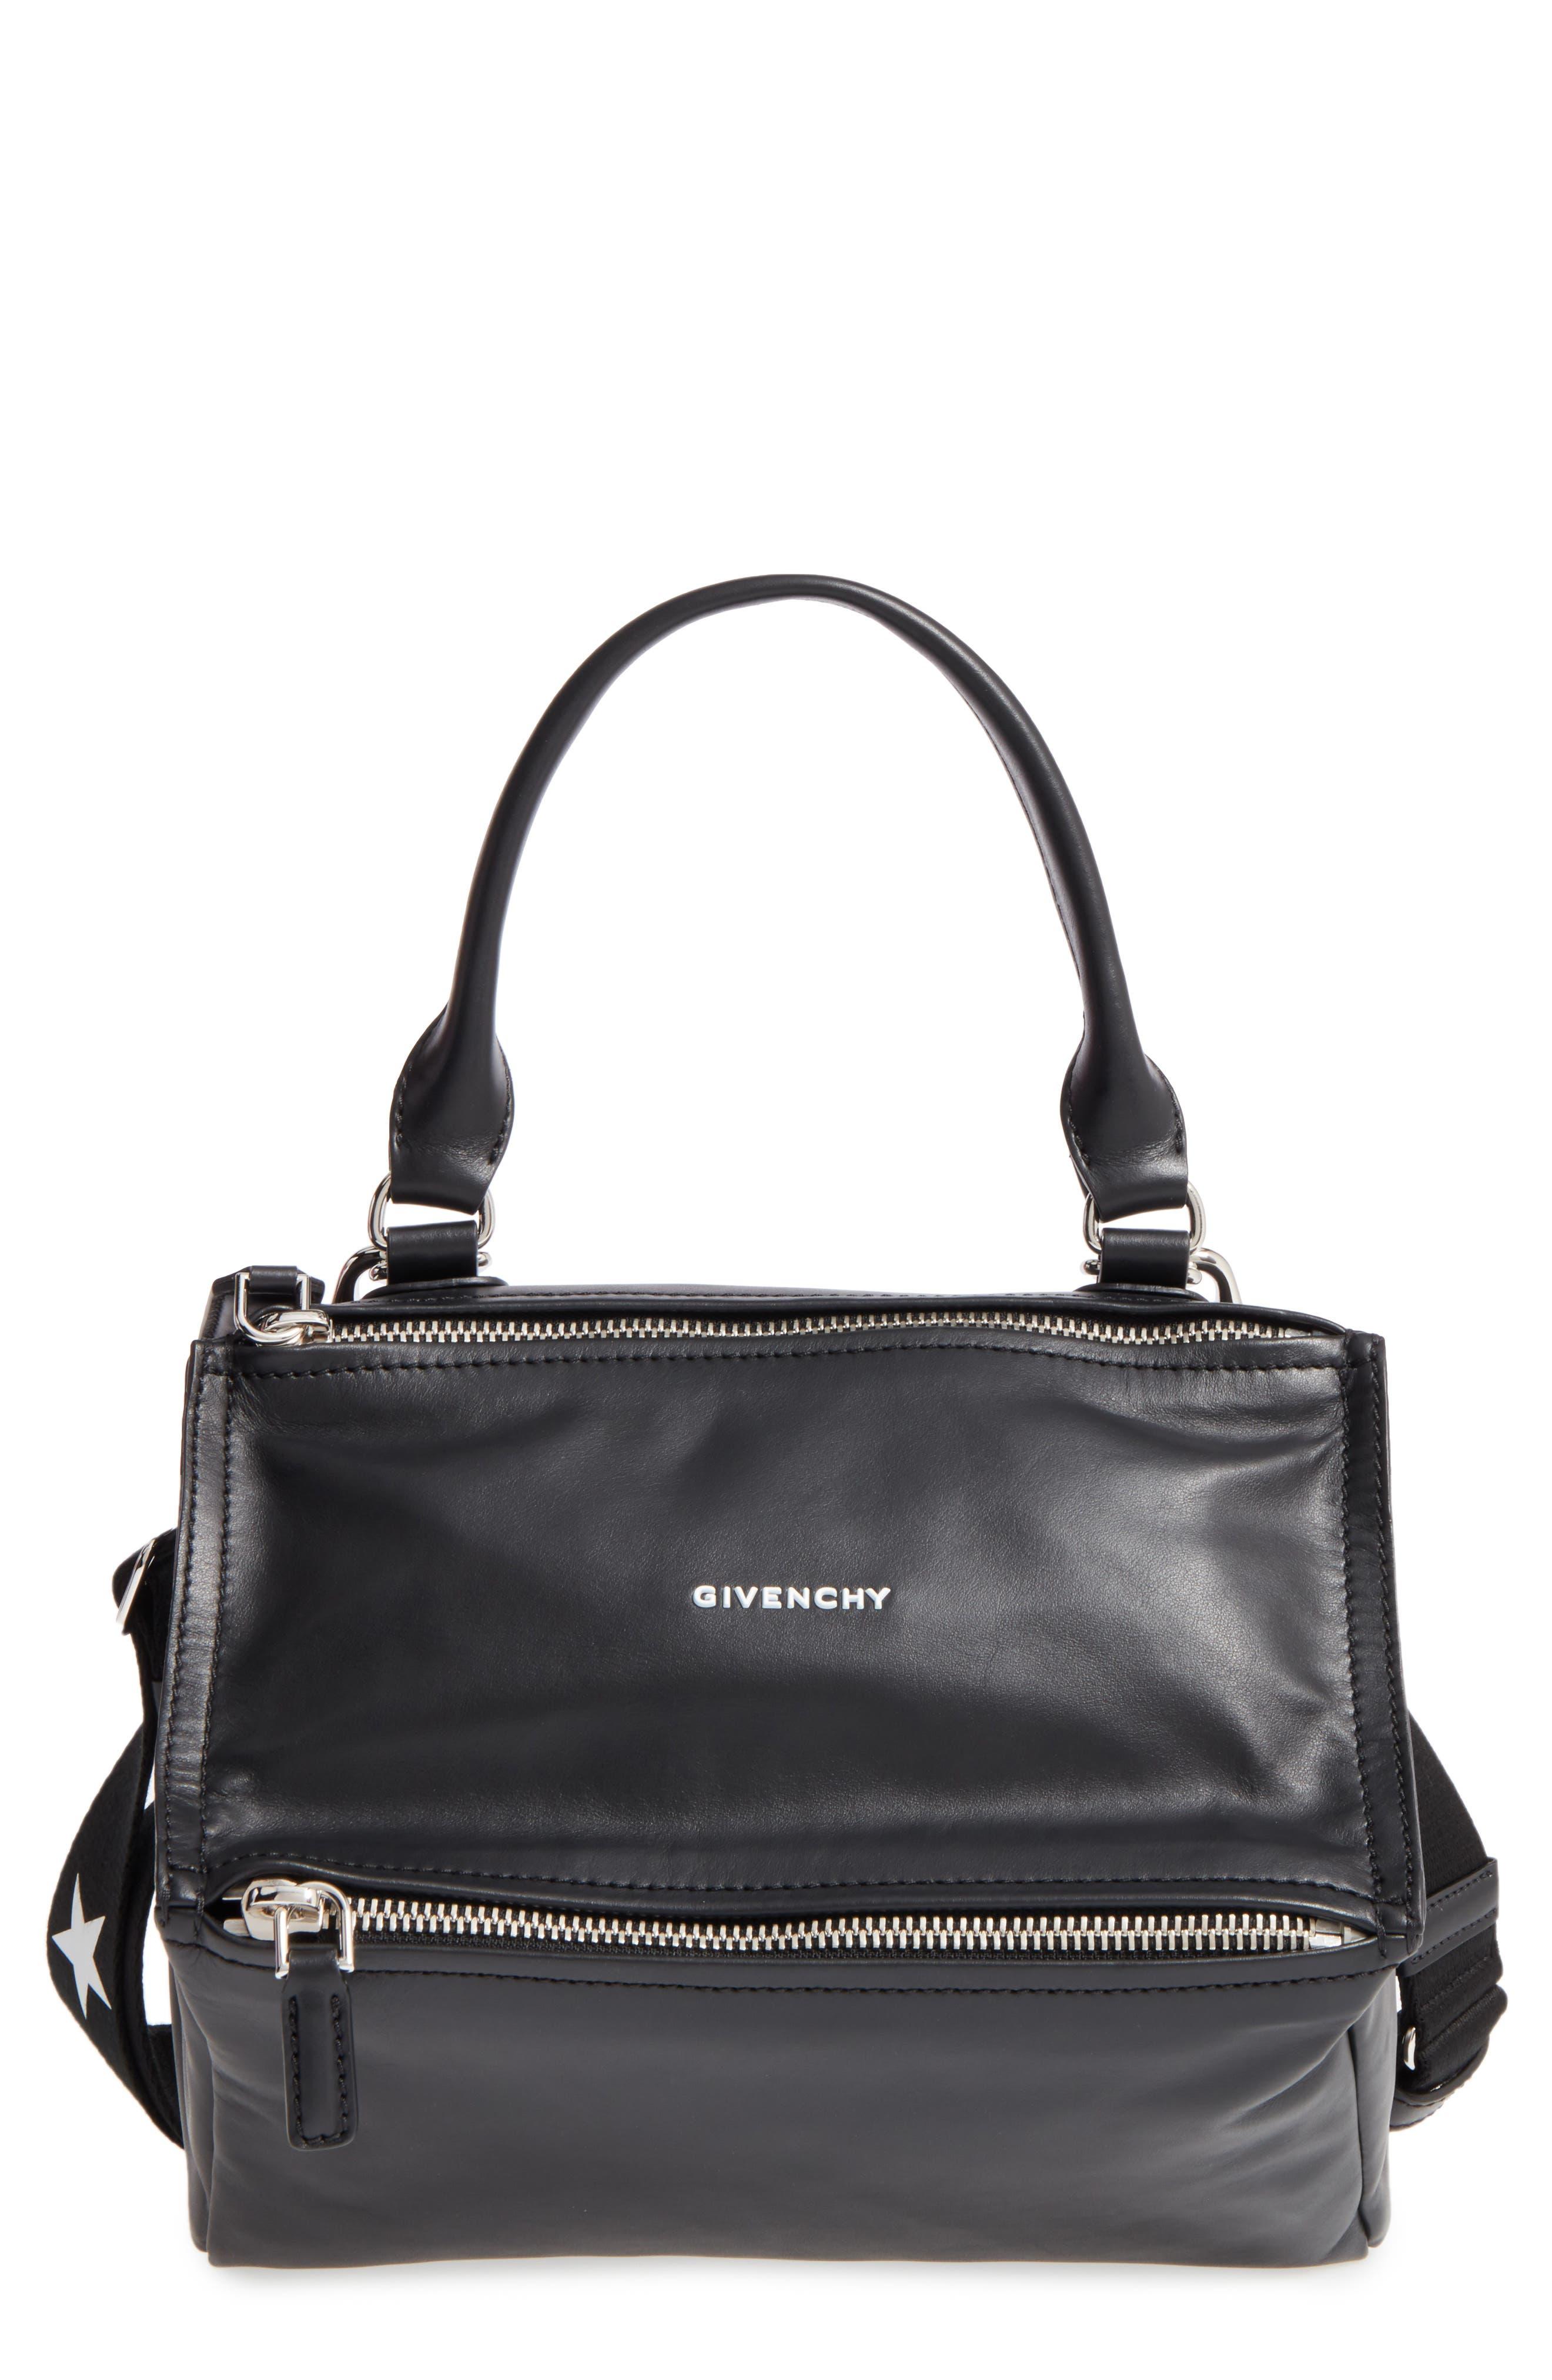 GIVENCHY Small Pandora - Logo Leather Satchel